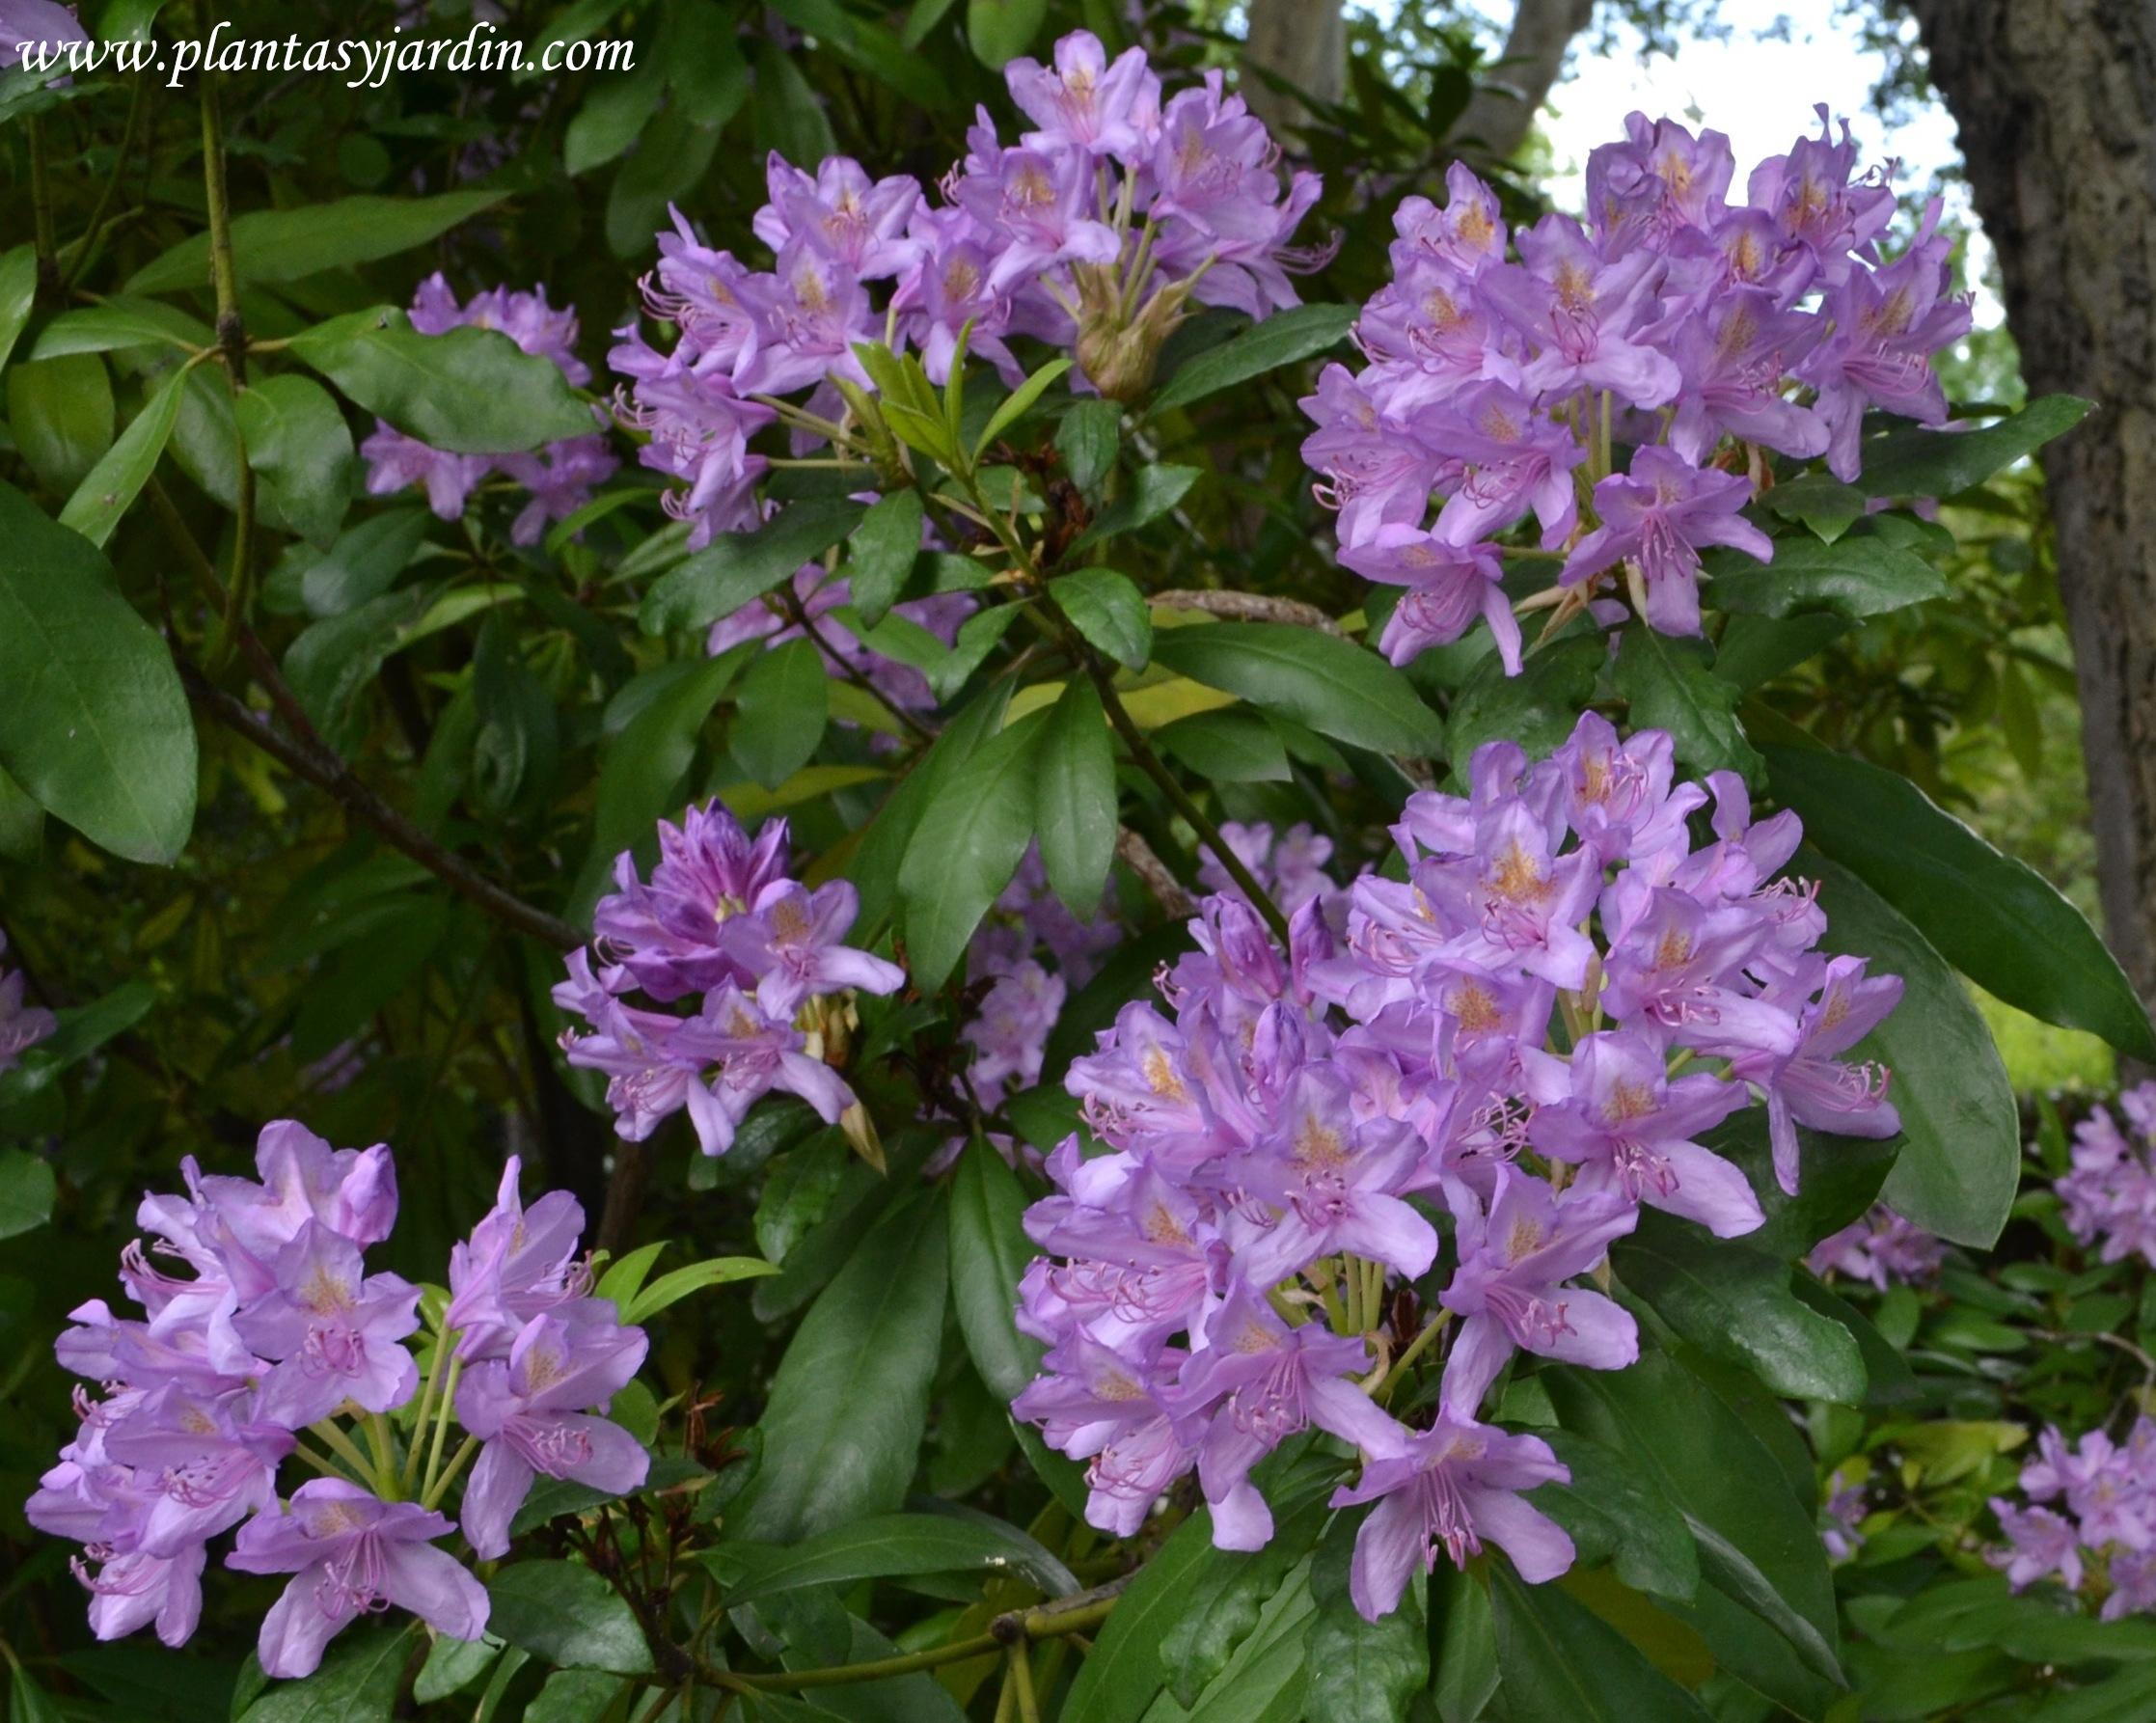 http://plantasyjardin.com/wp-content/uploads/2011/08/Rhododendron-ponticum-Hojaranzo-detalle-floraci%C3%B3n..jpg